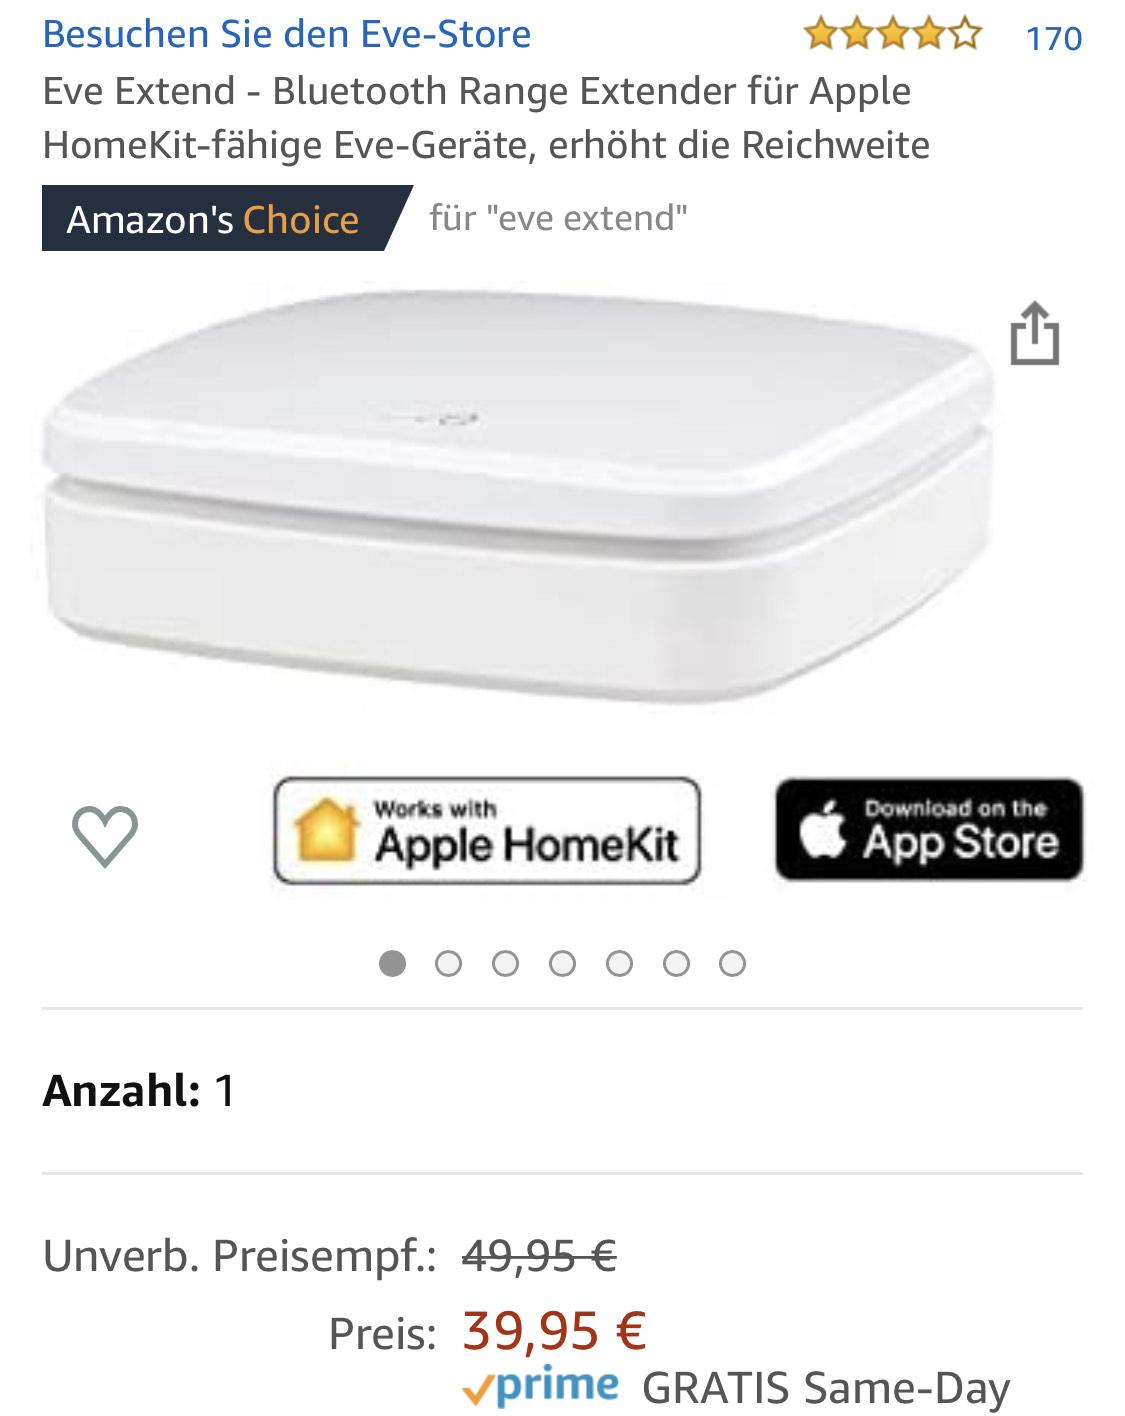 [Prime] - Eve Extend - Bluetooth Range Extender für Apple HomeKit-fähige Eve-Geräte